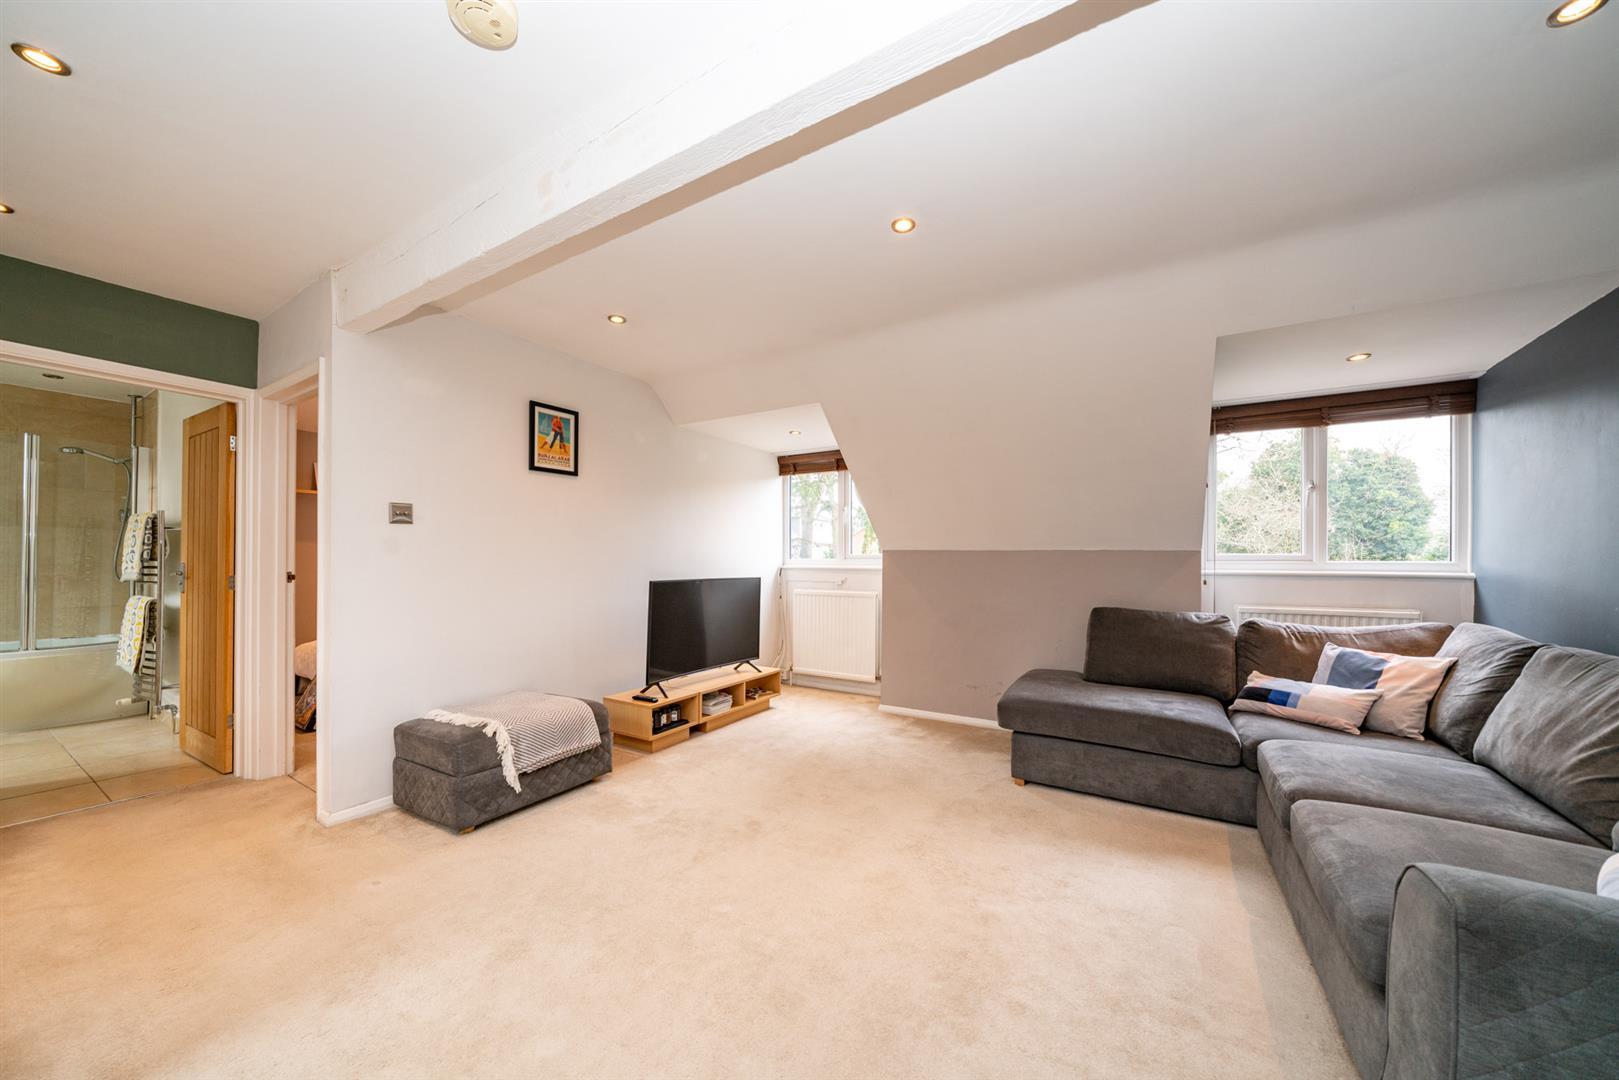 Flat-6-Ruscoe-5108-  living room 1.jpg